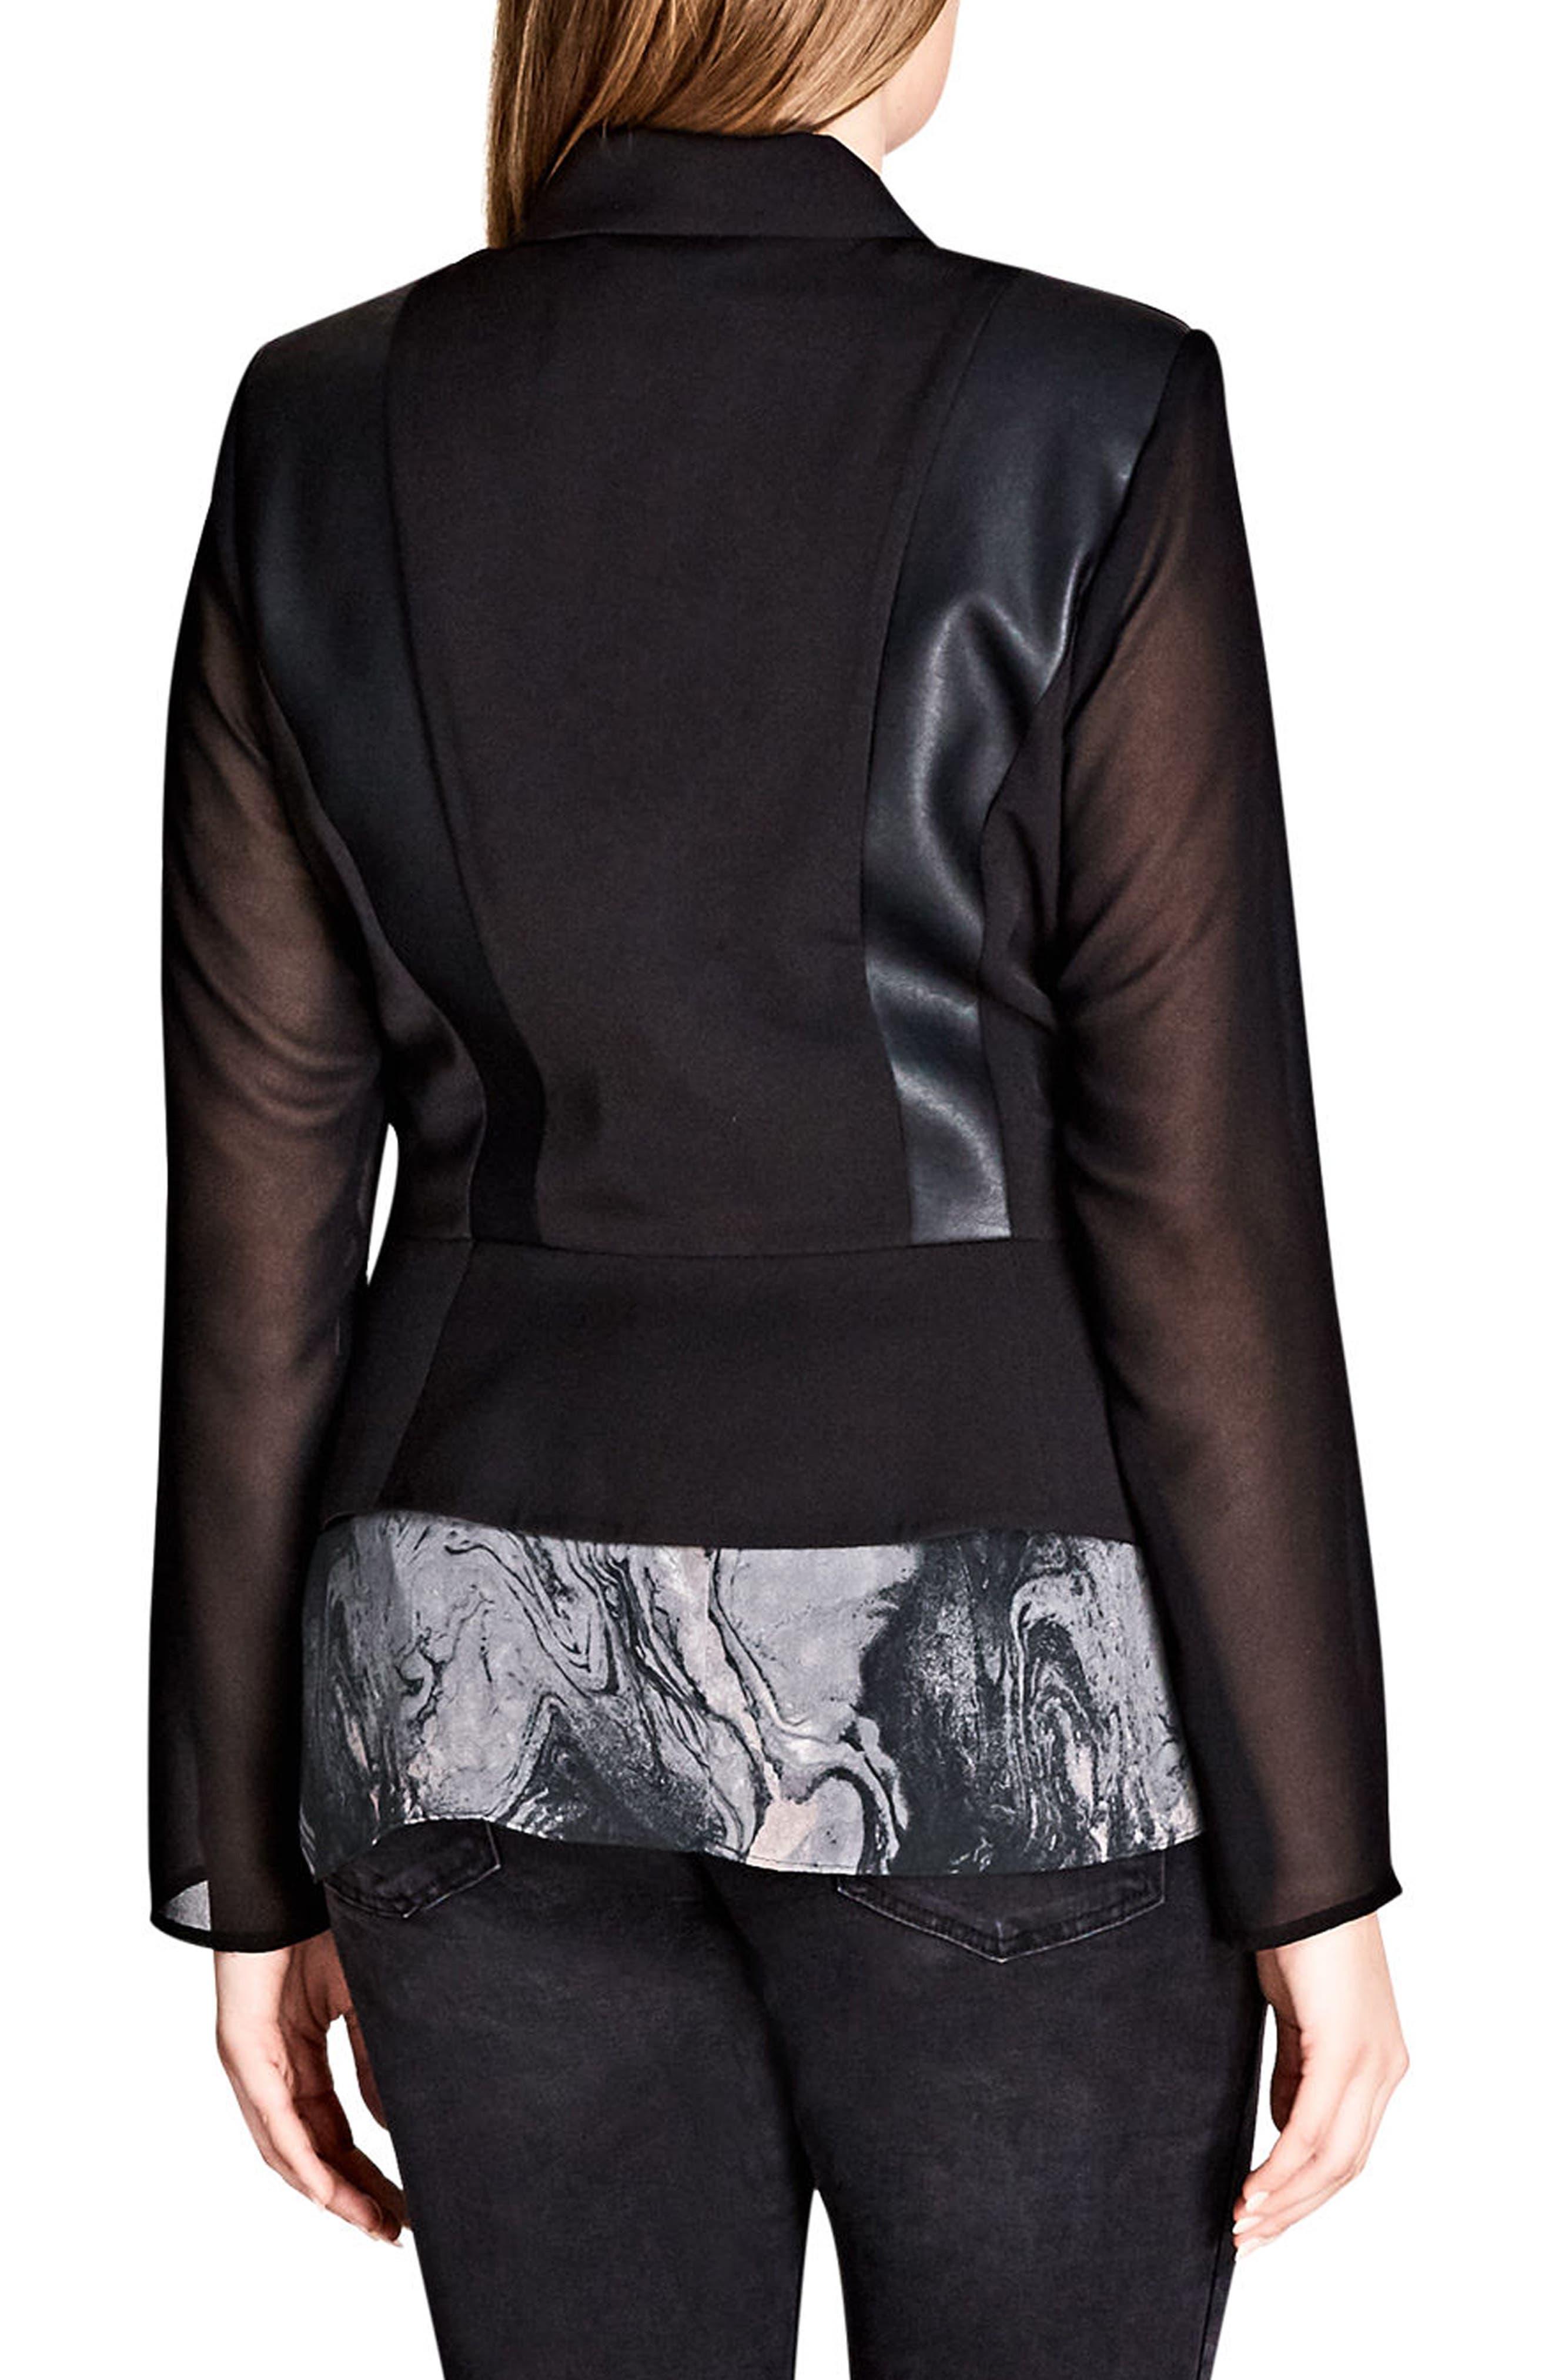 Sharp & Sheer Jacket,                             Alternate thumbnail 2, color,                             Black